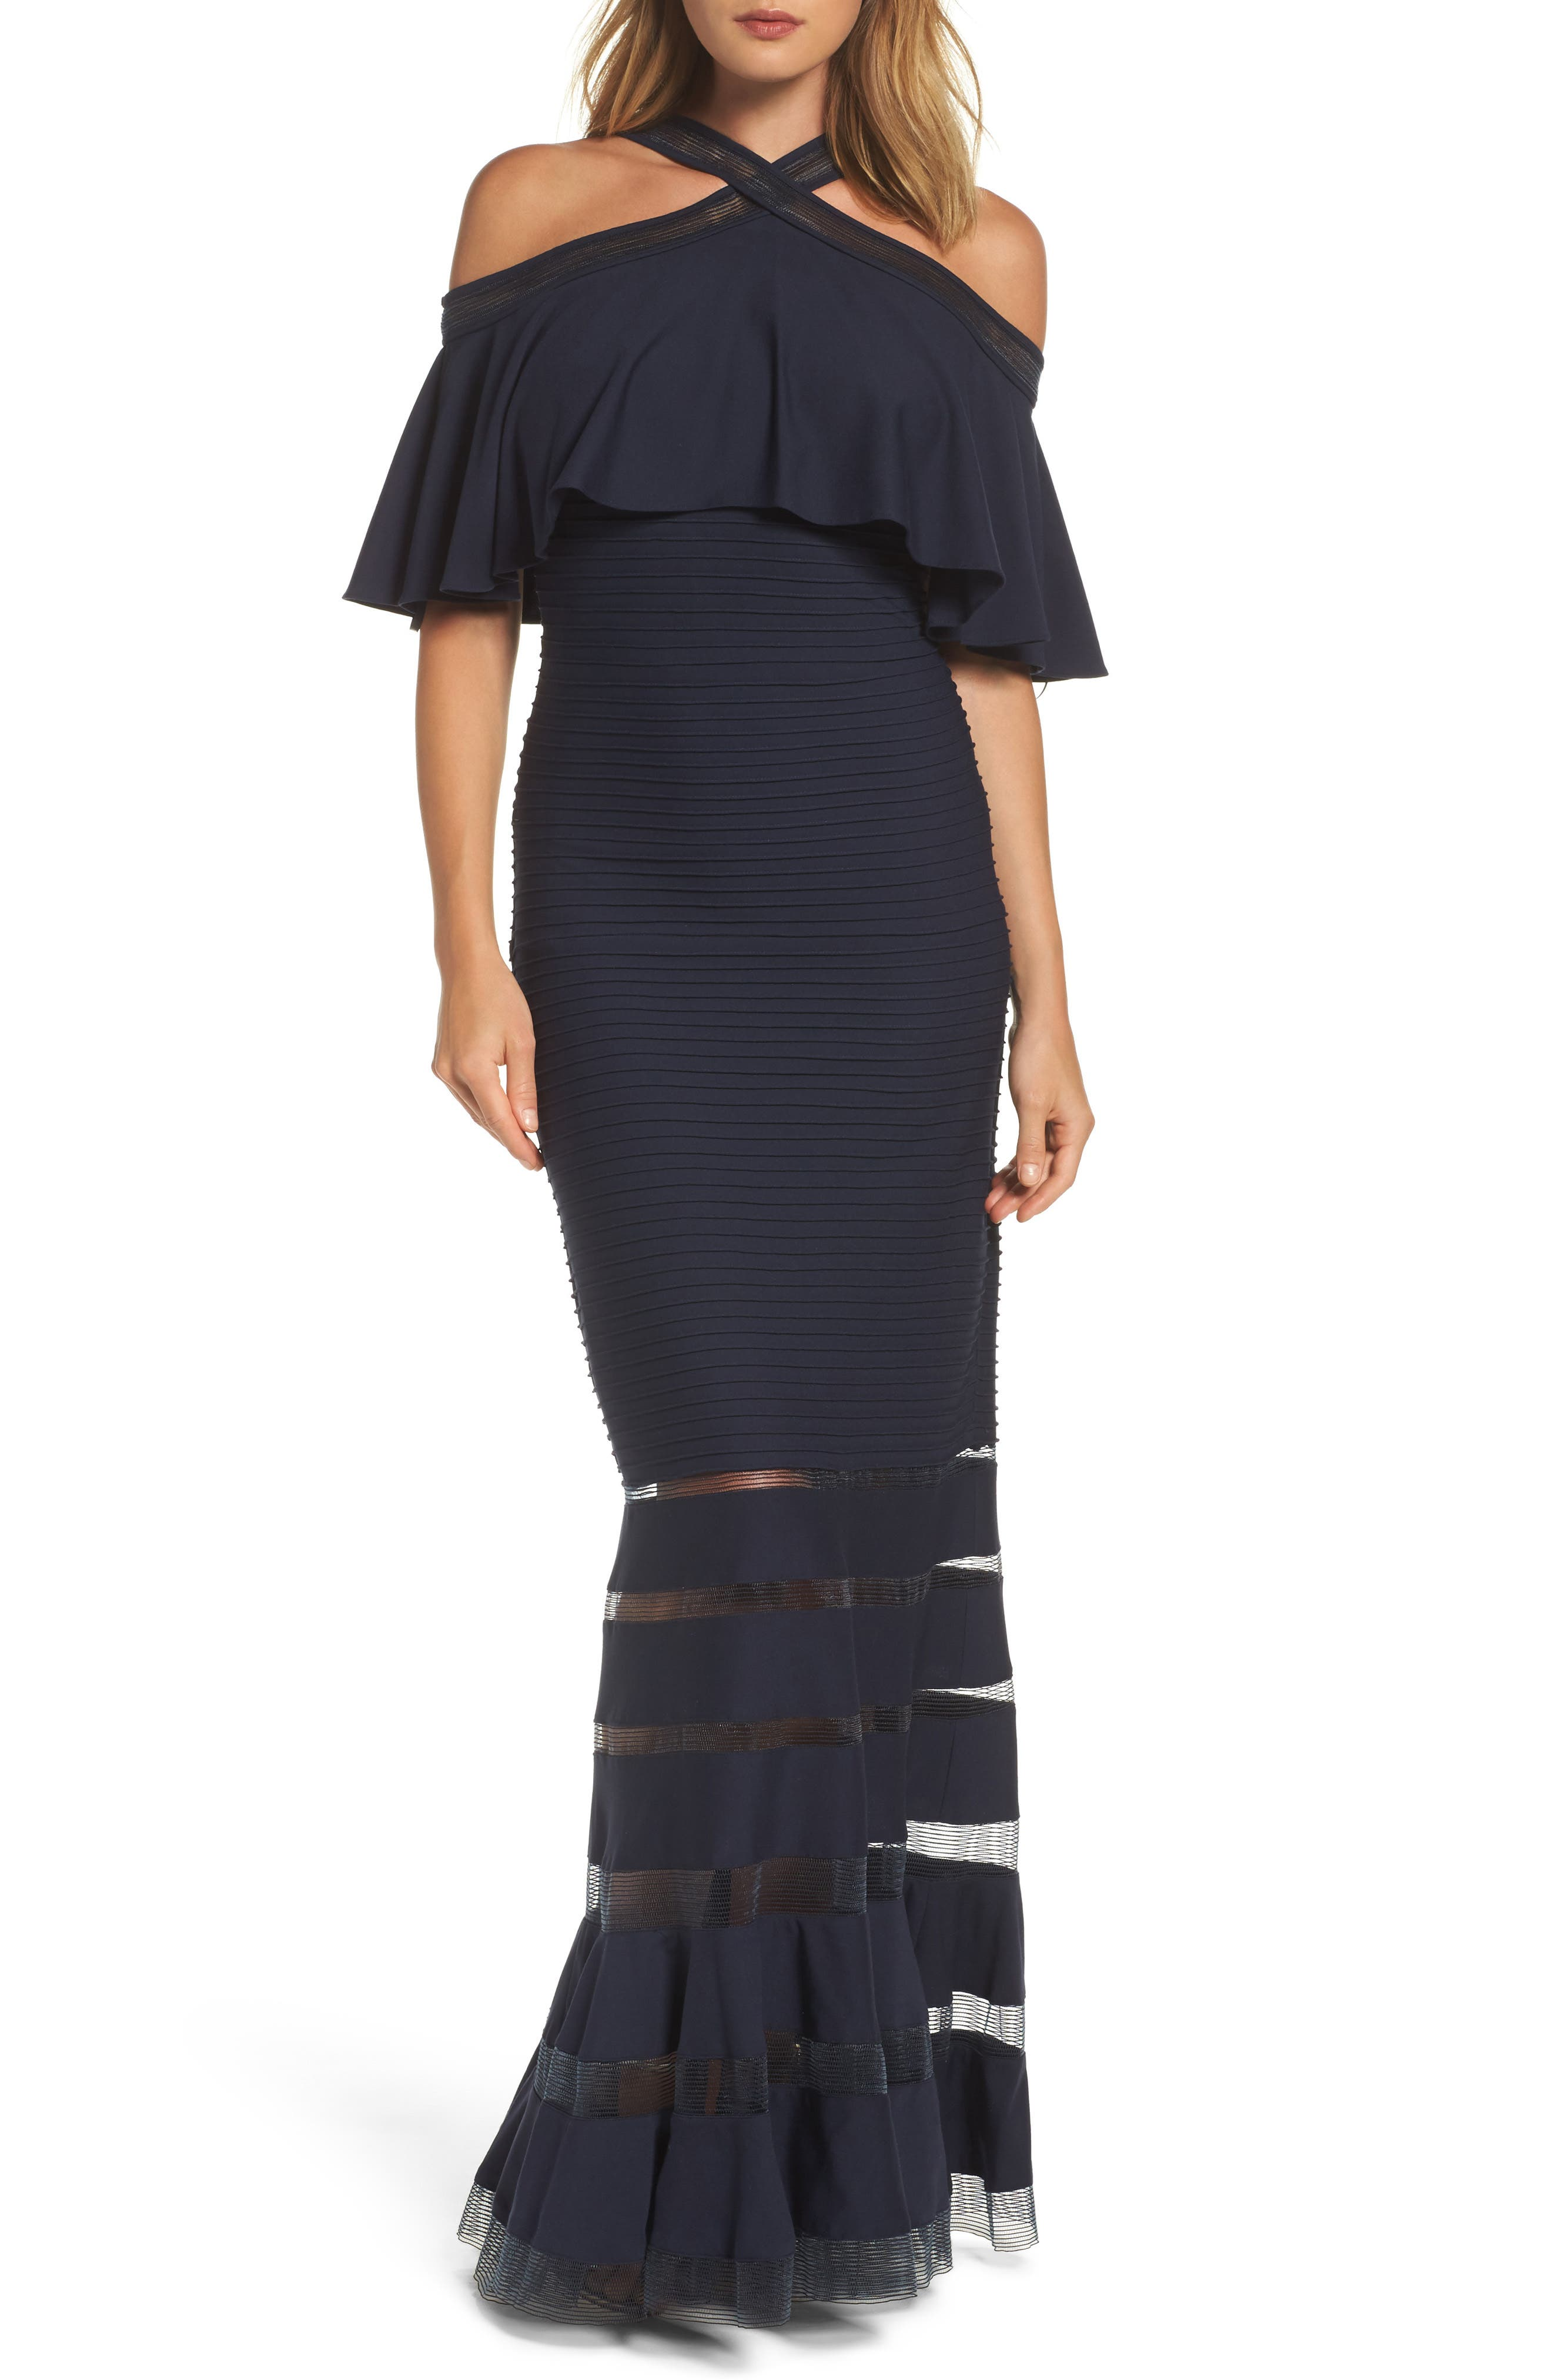 Alternate Image 1 Selected - Tadashi Shoji Jersey Cold-Shoulder Gown (Regular & Petite)